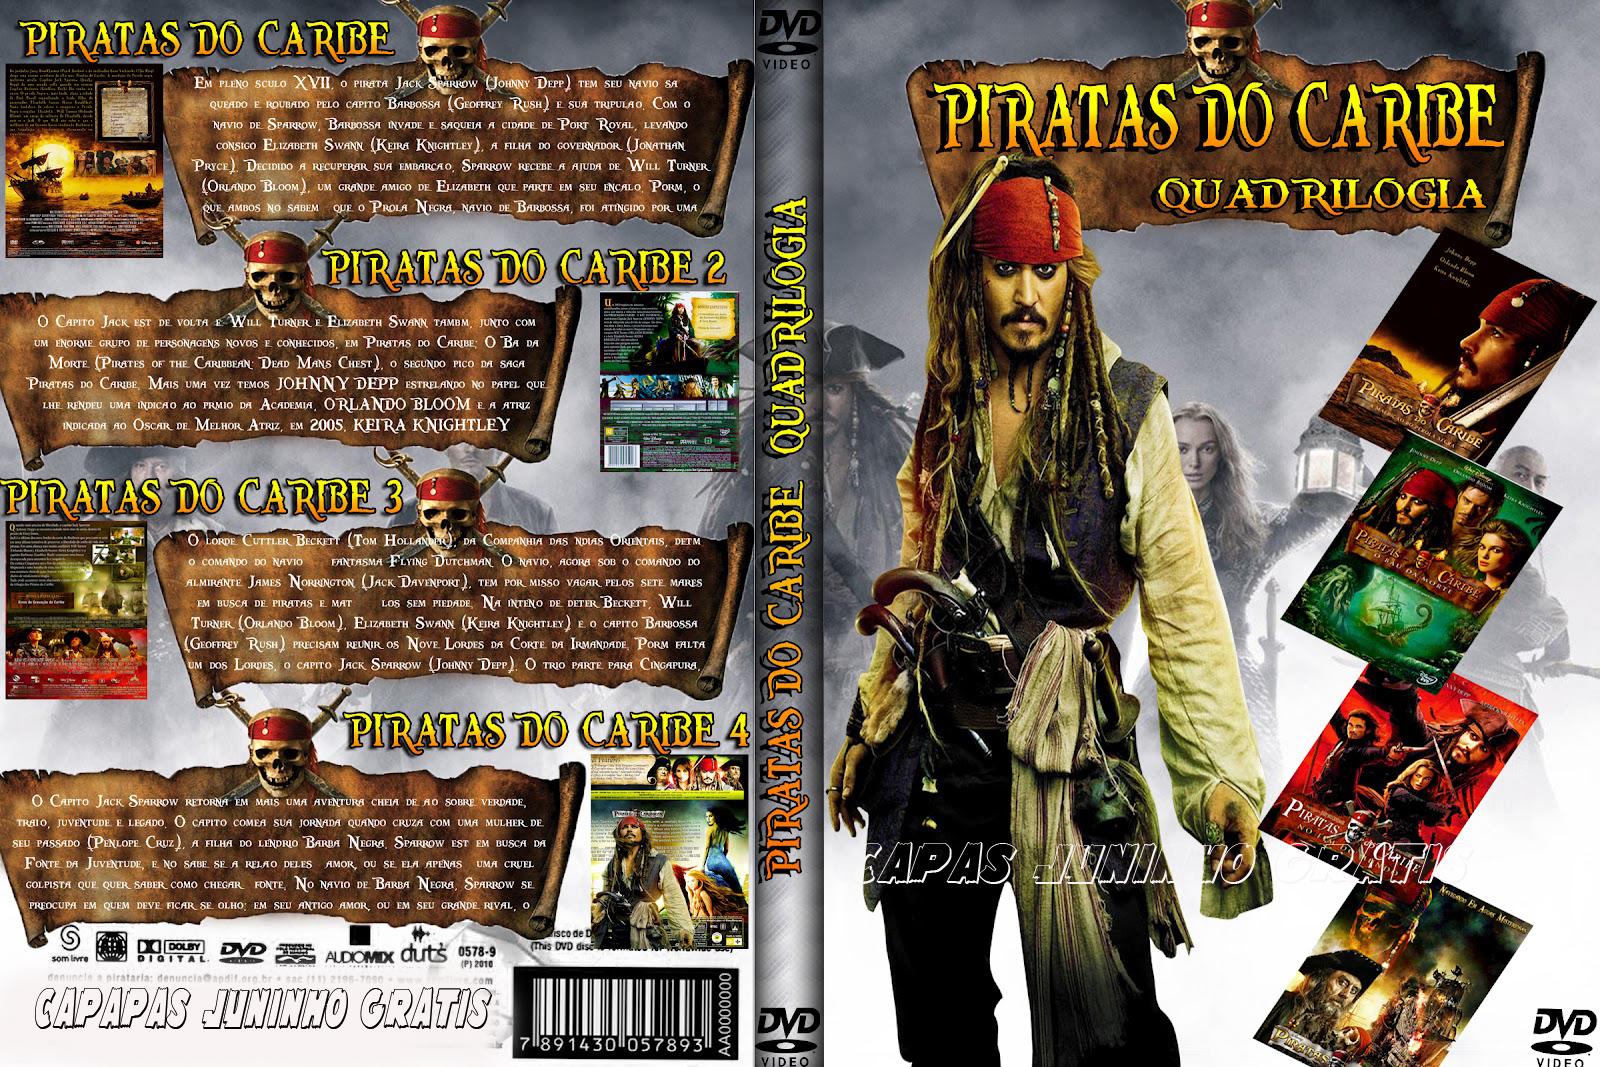 Piratas do caribe 4 rmvb (download torrent) tpb.